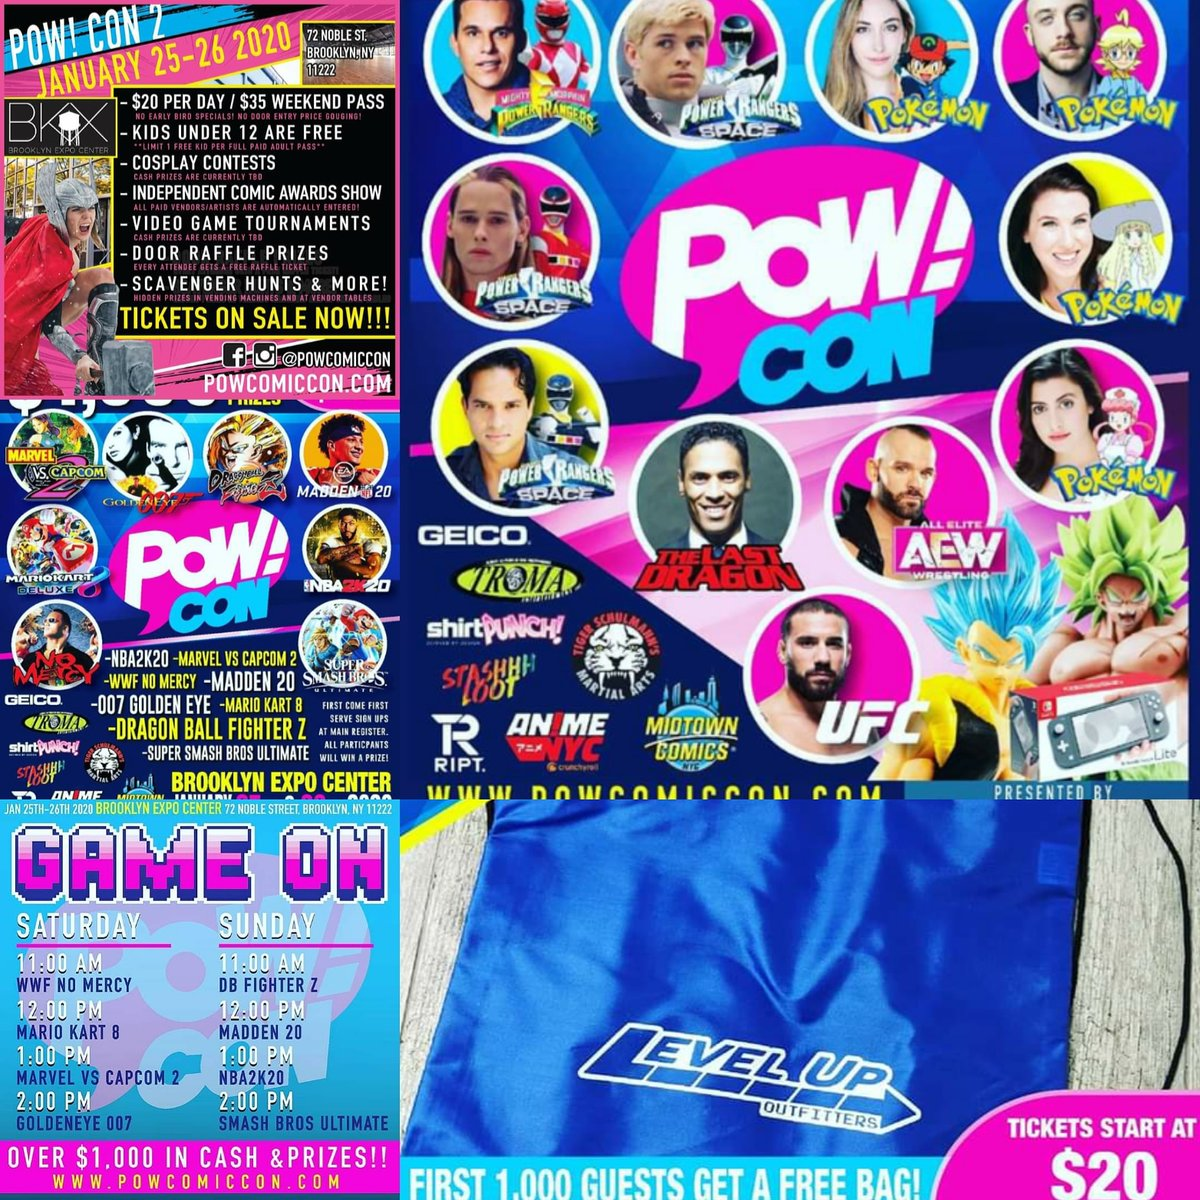 PowCon (@comic_pow) is next weekend. Did you get your tickets yet??? Don't you dare miss out! #powcon #powcon2020 #powcomiccon #strangeinthemembrane #geekculture #geekpodcast #daretobestrange #wearethechange #gothampodcaststudiopic.twitter.com/PBqCImF1nQ